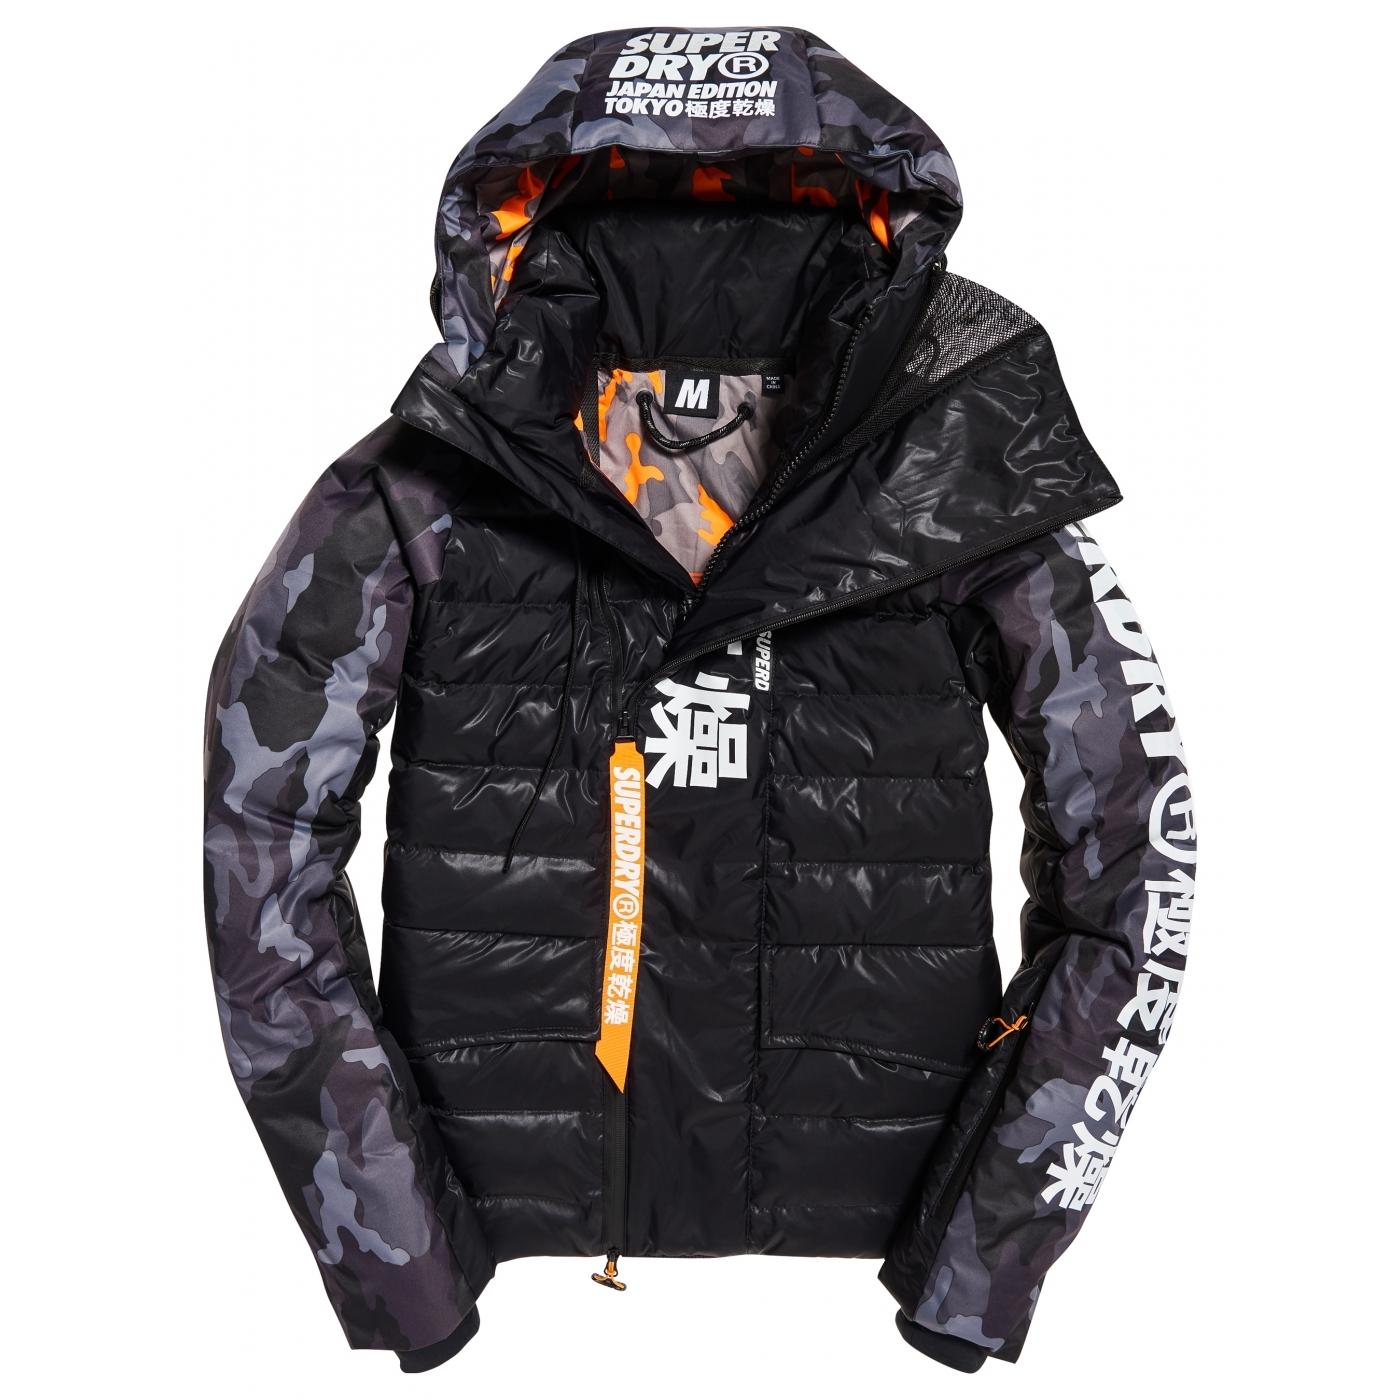 ffaac645c610c Veste De Ski Superdry Japan Edition Snow Down Jacket Camo ...